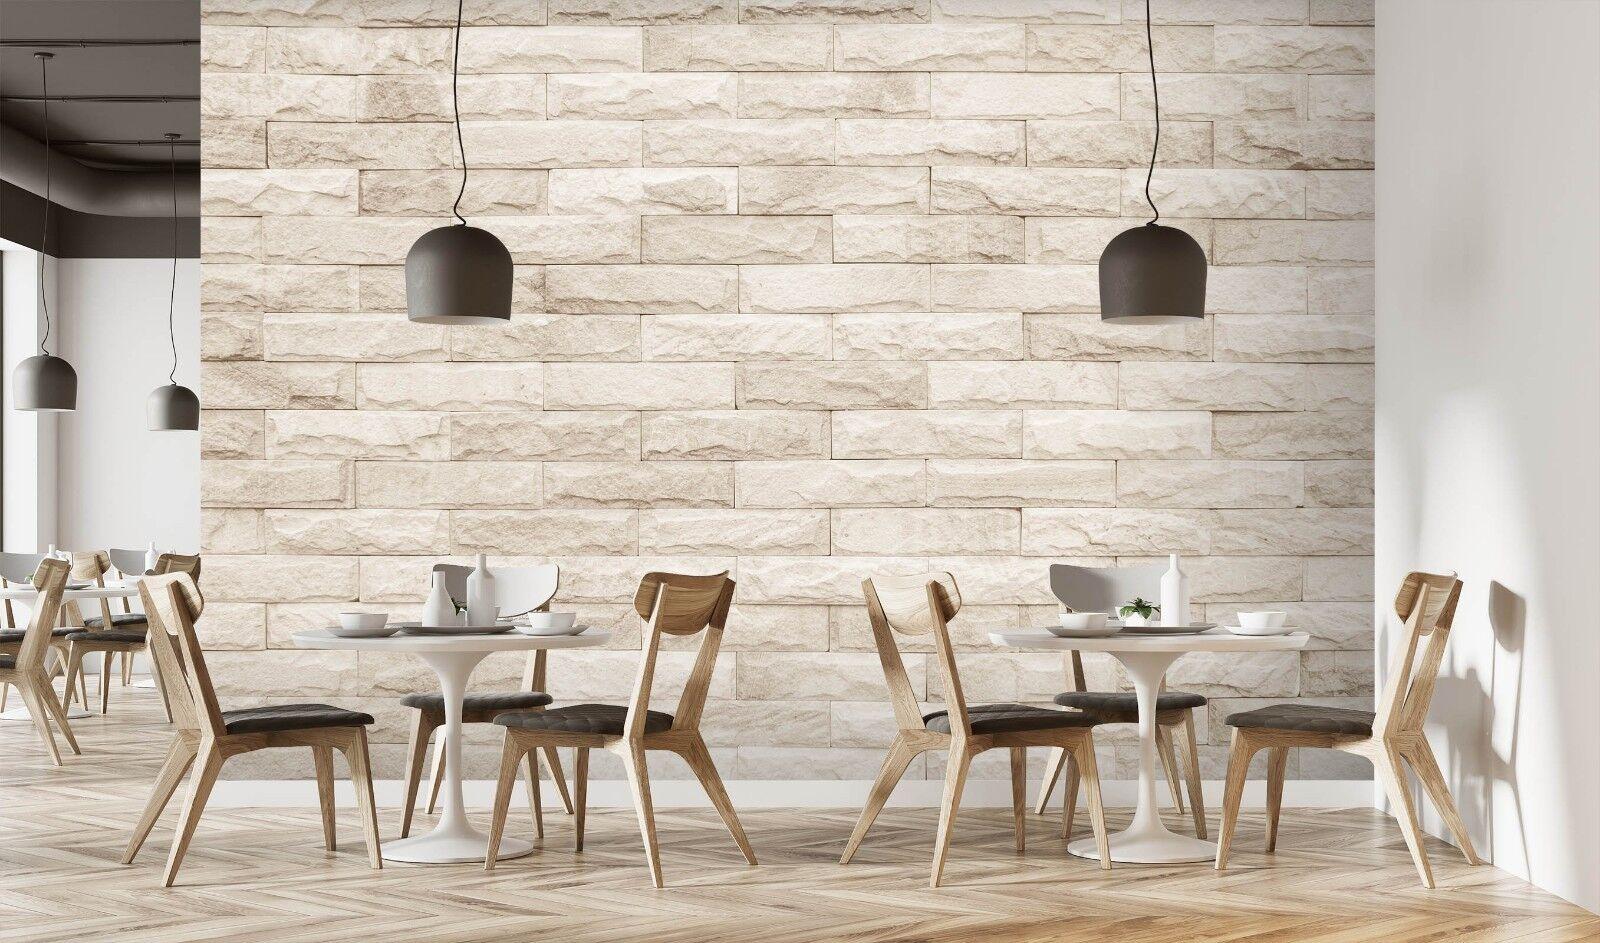 3D Bump Wall Wall Wall 9232 Texture Tiles Marble Wall Paper